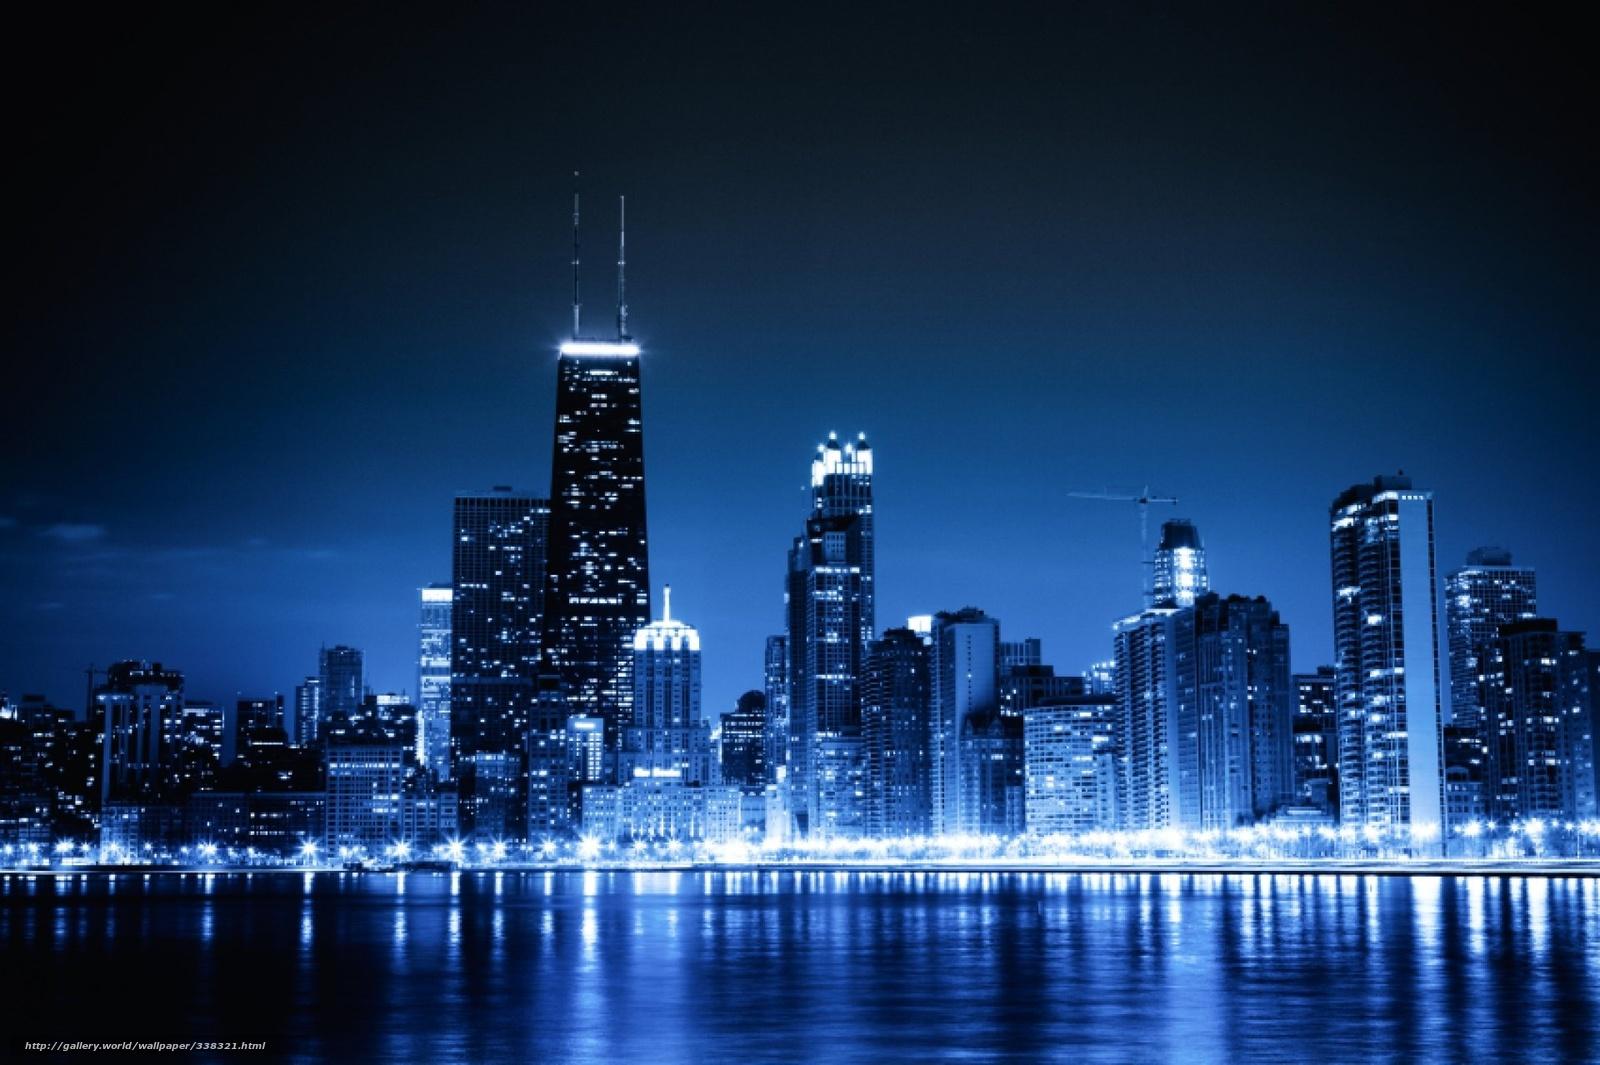 Scaricare Gli Sfondi Chicago Blu Notte Citt Semaforo Sfondi